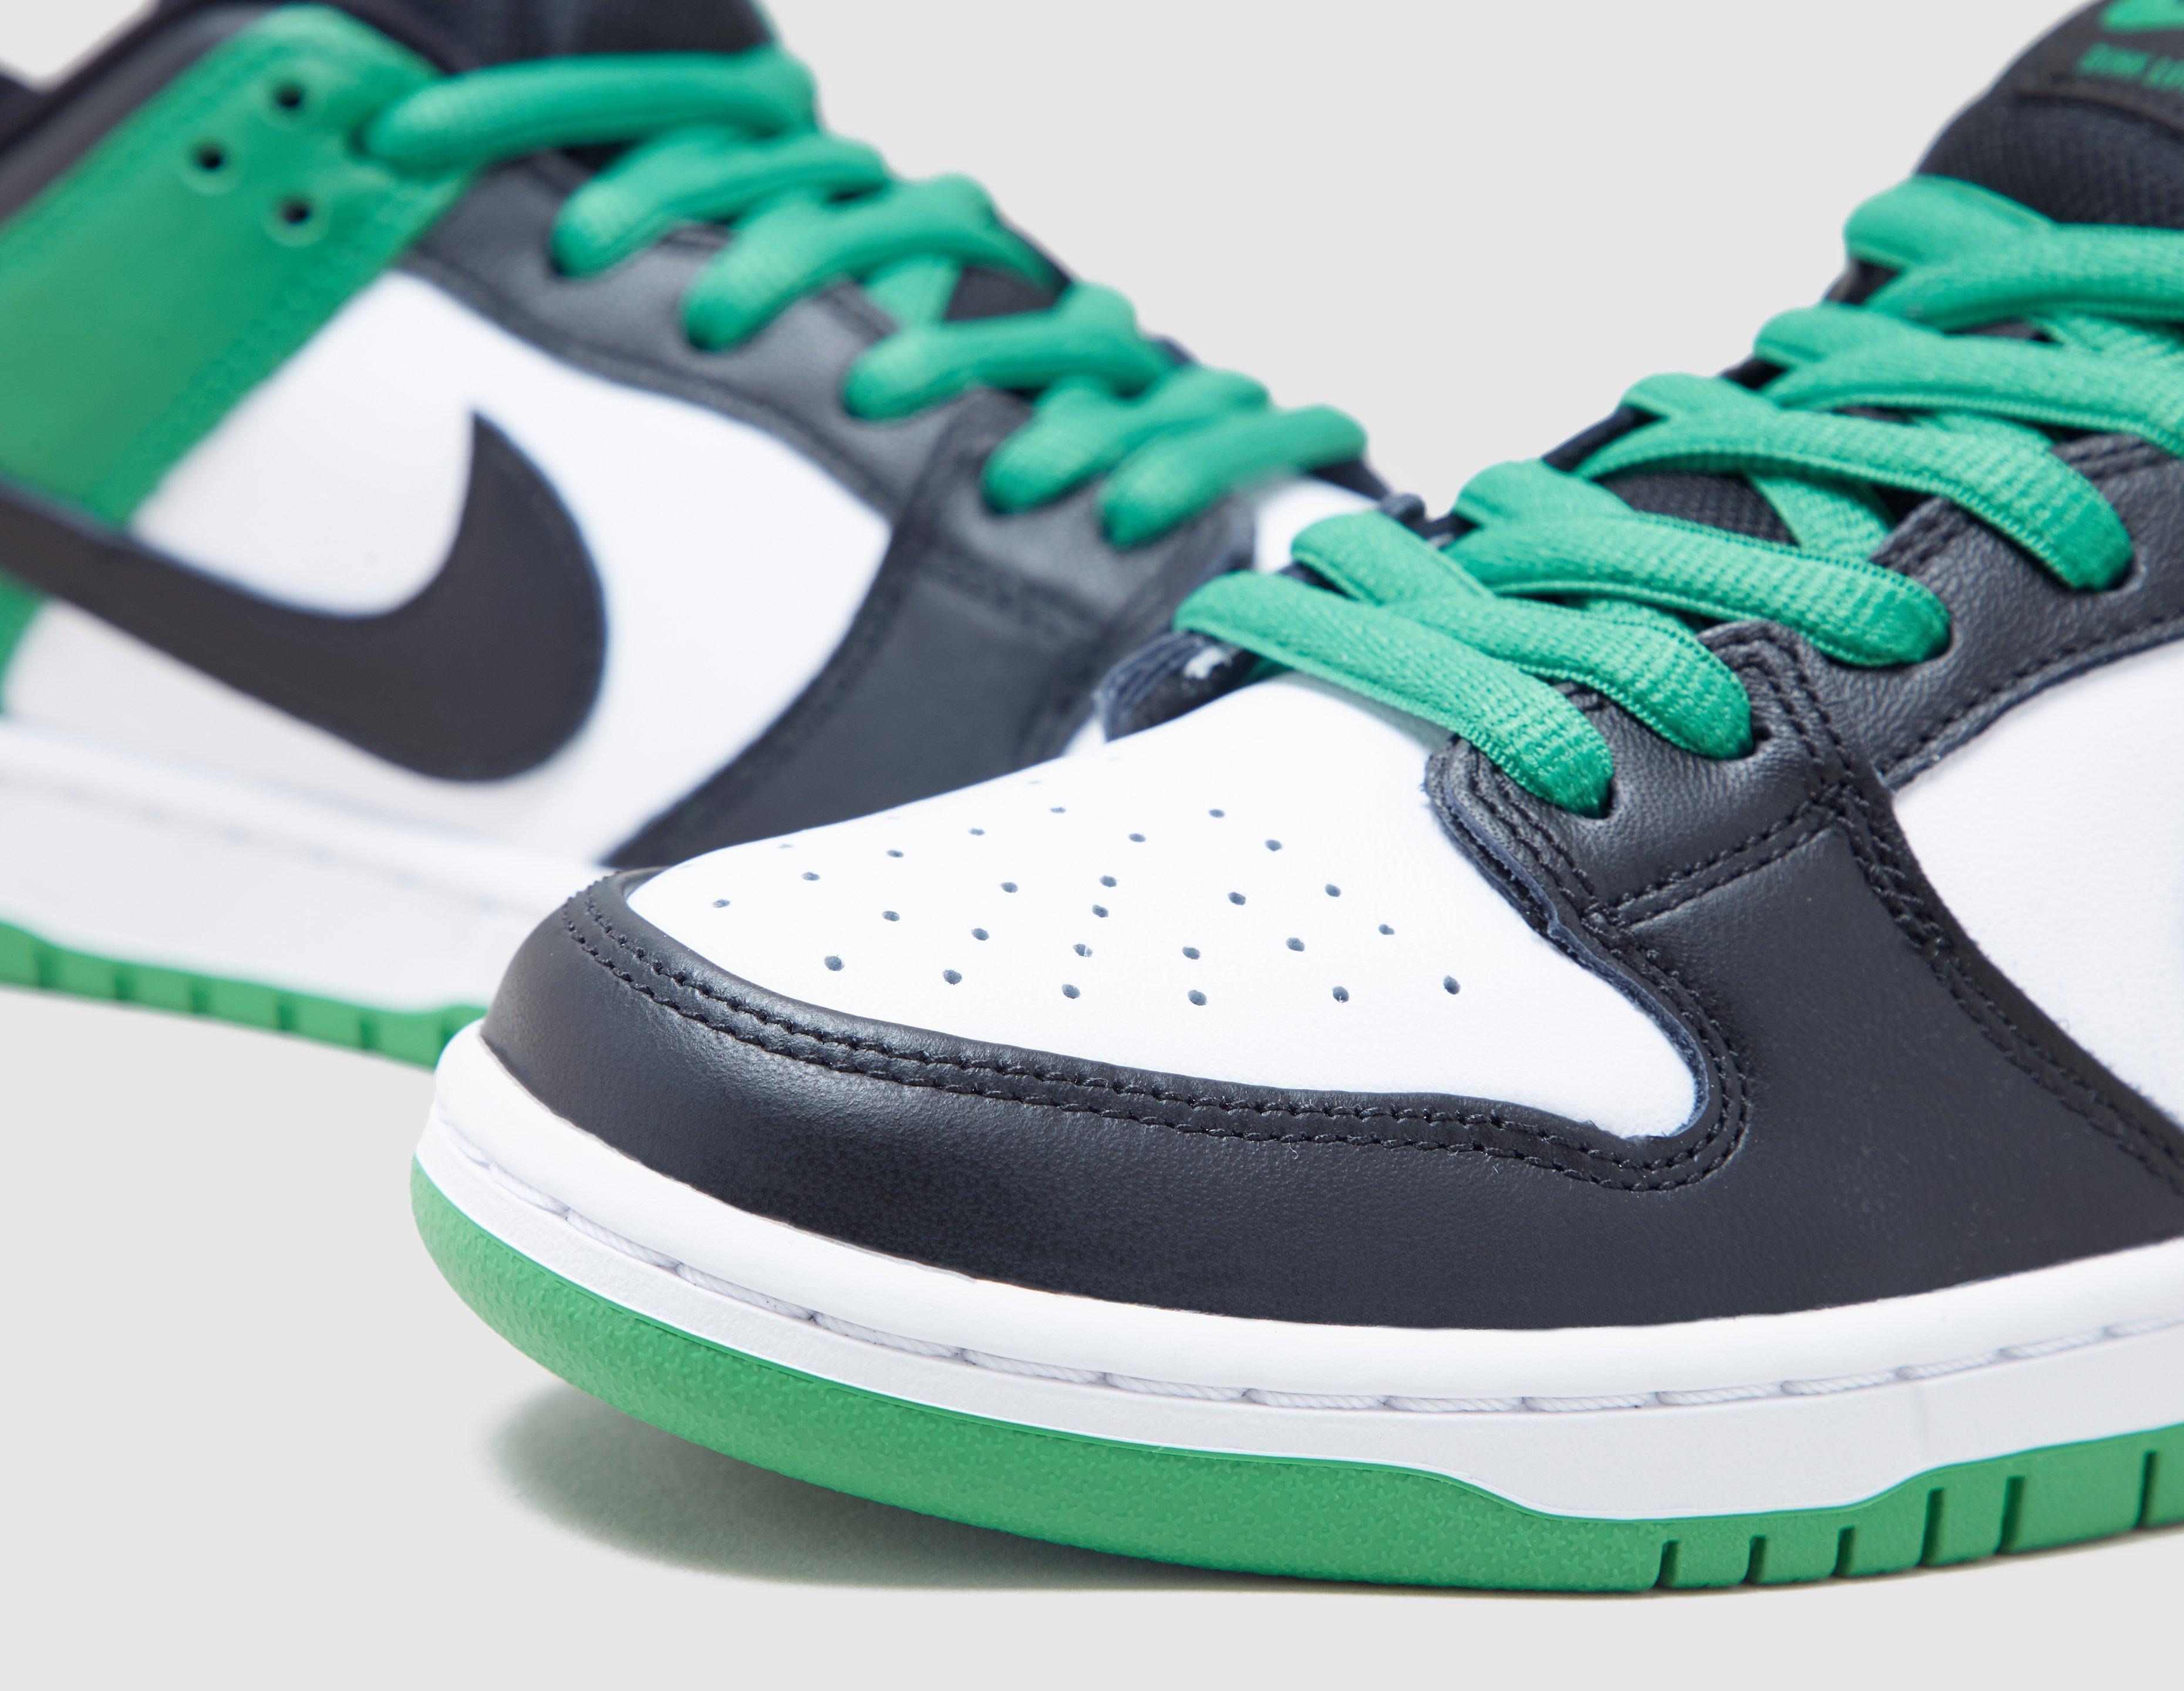 Nike SB Dunk Low 'Classic Green' BQ6817-302 Toe